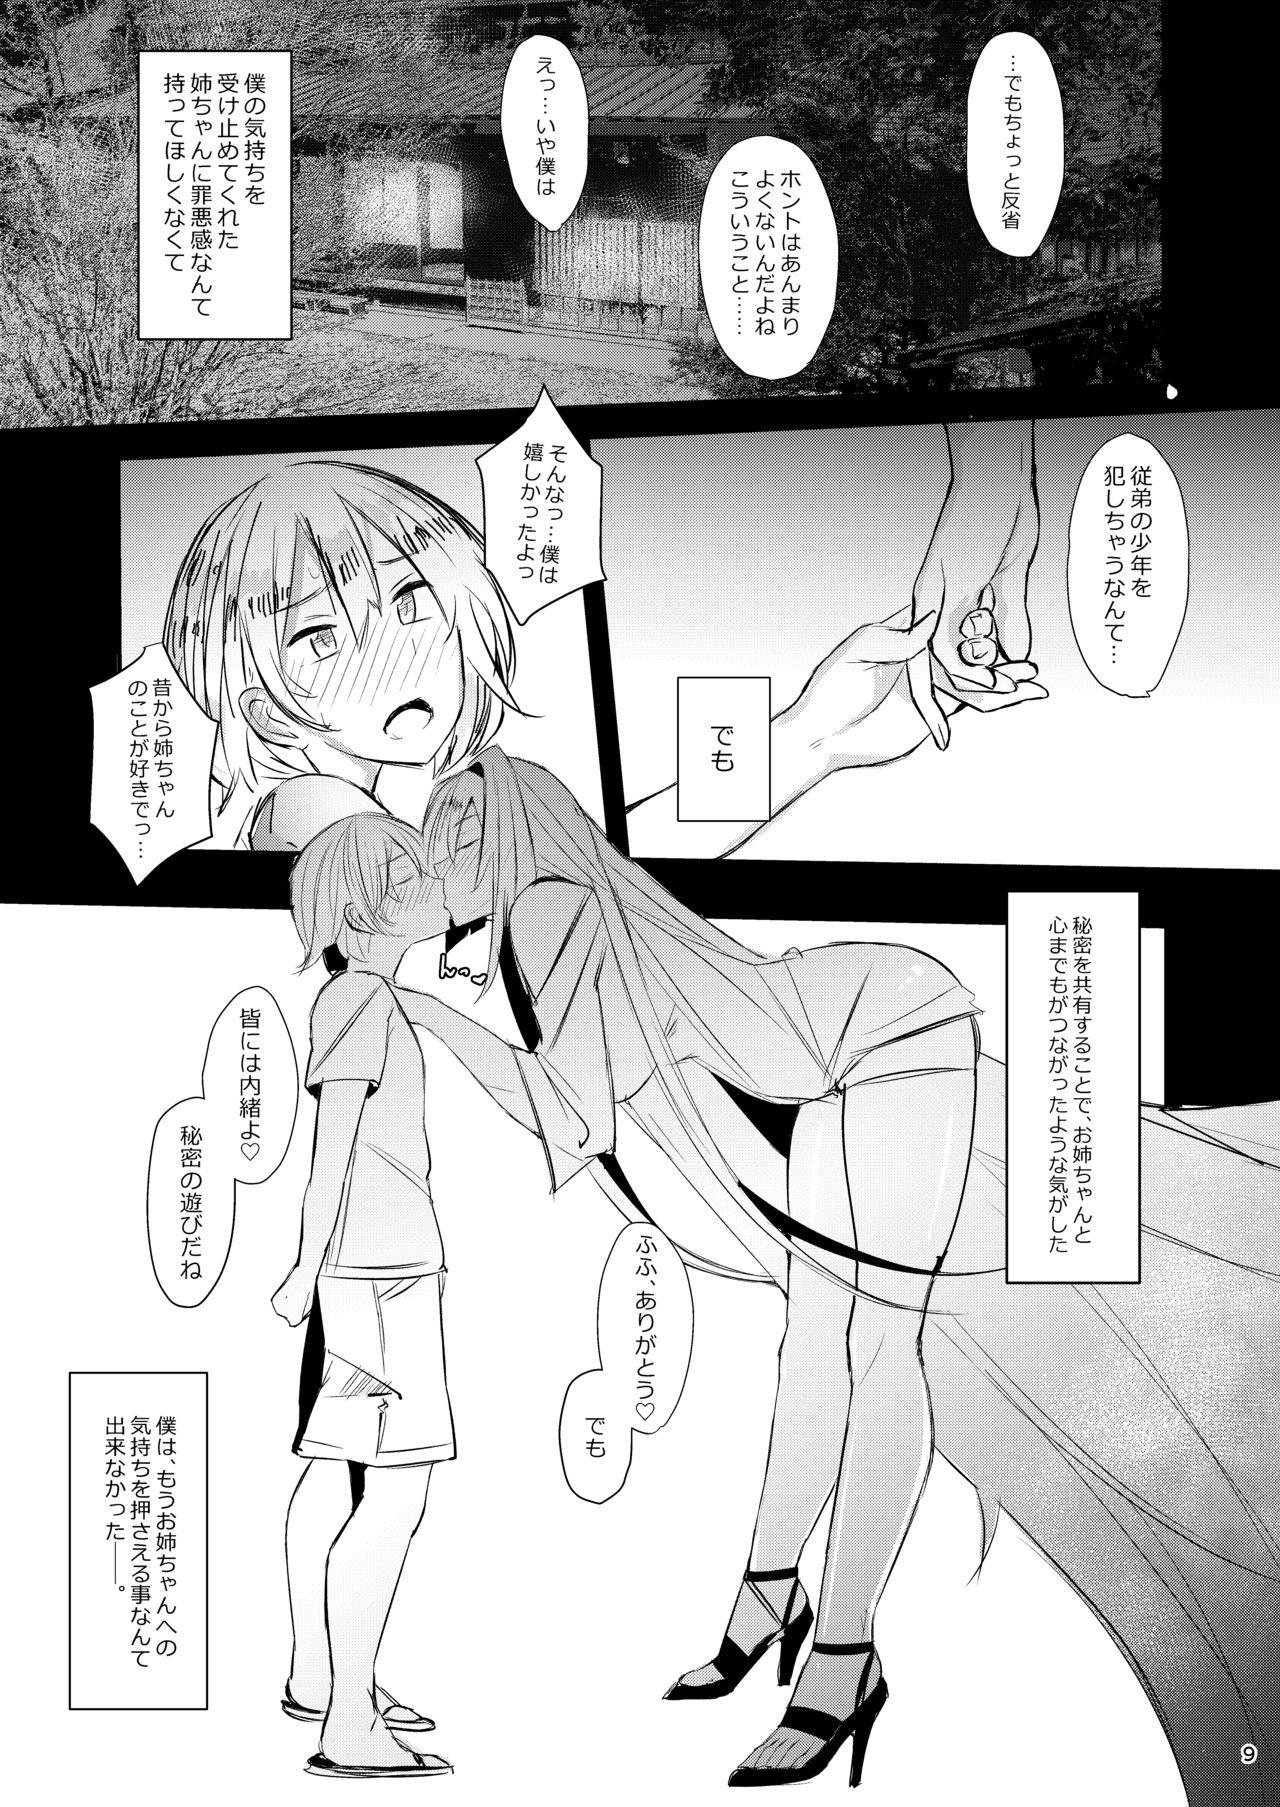 [L.G.C. (Rib:y(uhki))] Onee-chan wa Uchuu. - My elder sister is the universe. [Digital] 7